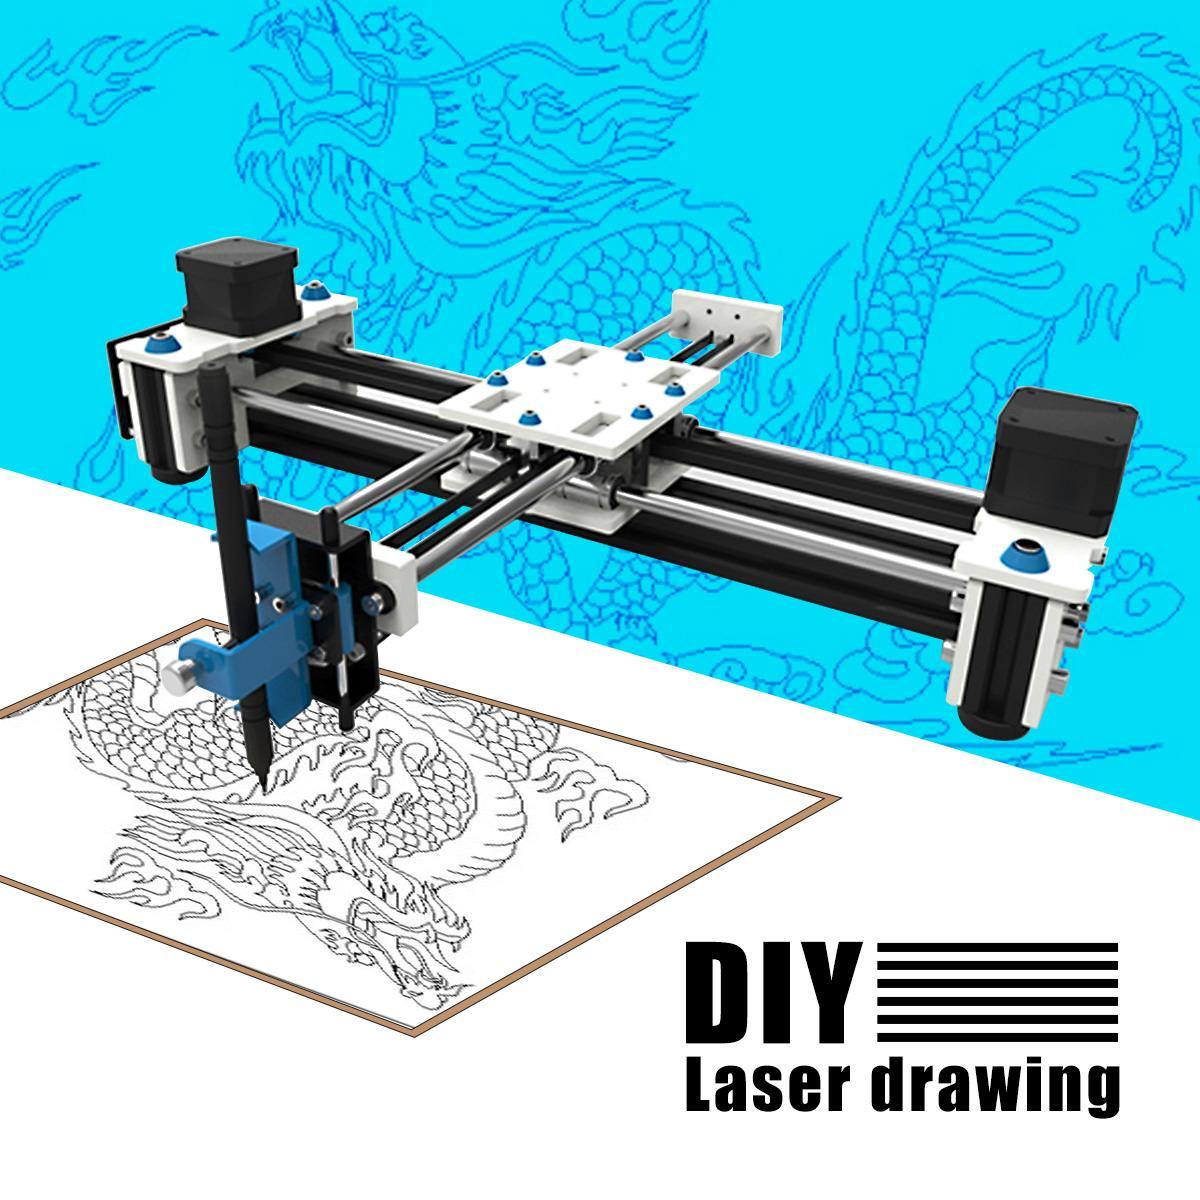 280x200mm Mini XY 2 axes CNC traceur stylo USB bricolage Laser Machine à dessin zone de gravure bureau dessin Robot